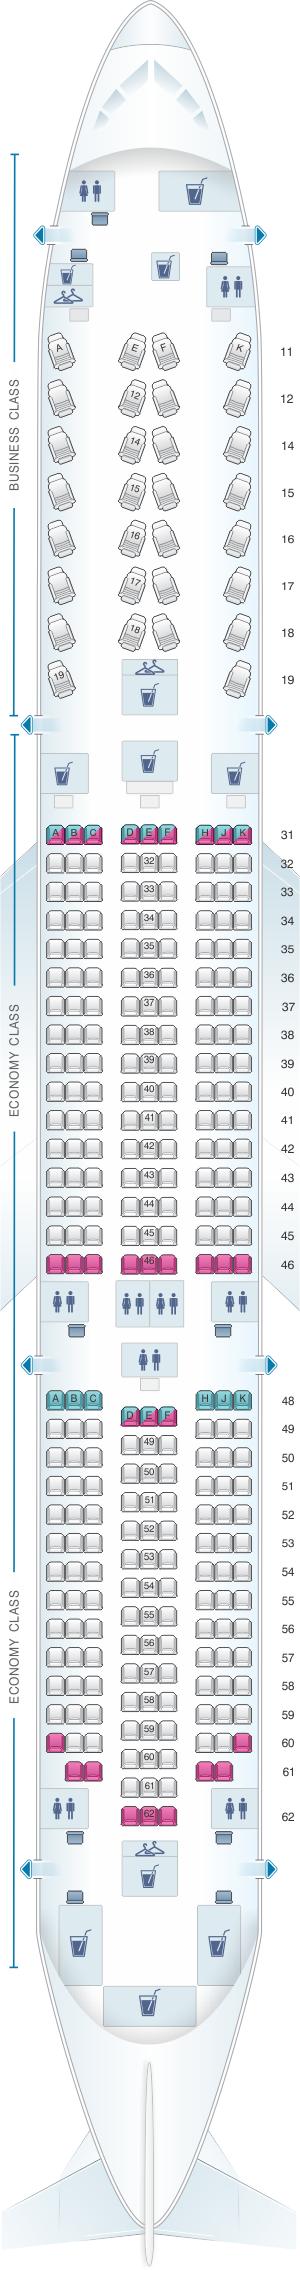 Seat map for Thai Airways International Boeing B787 9